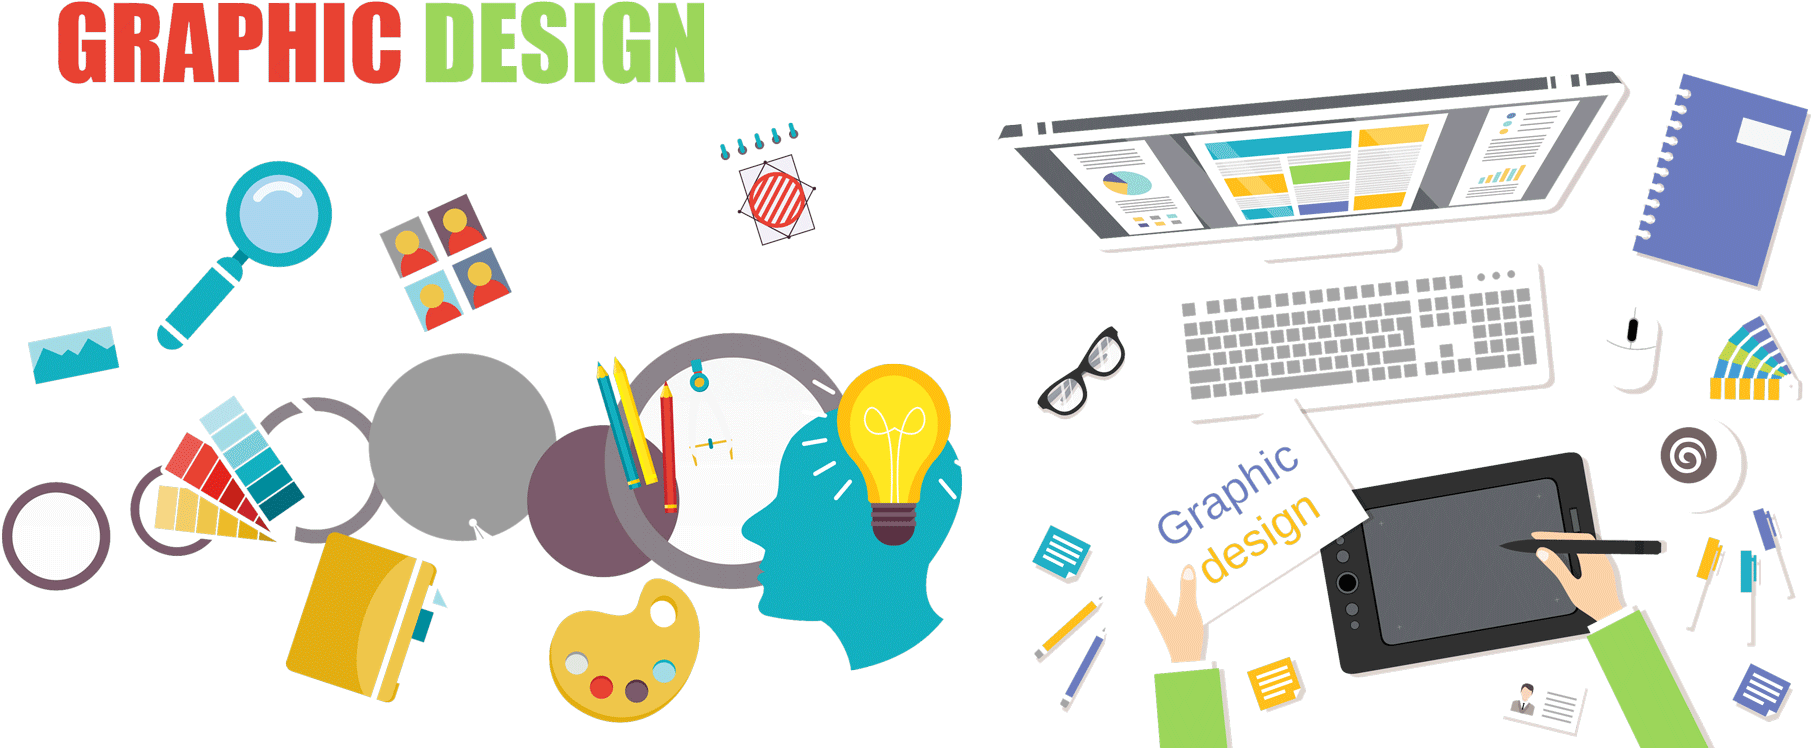 Should we design is a part of digital marketing?